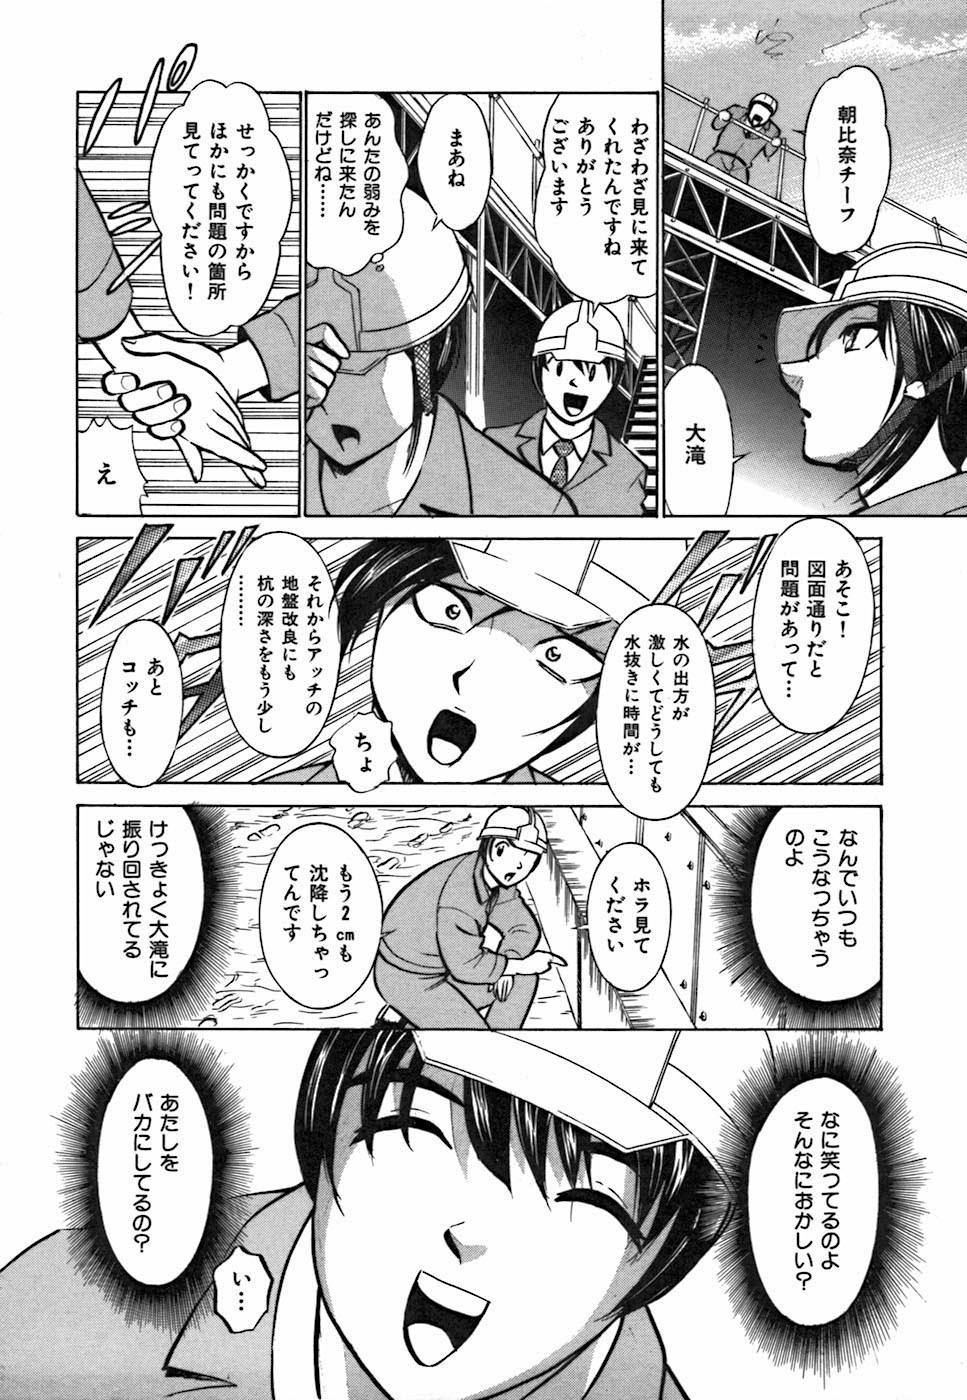 Kimi ga Nozomu Katachi | Appearance for which you hope 49